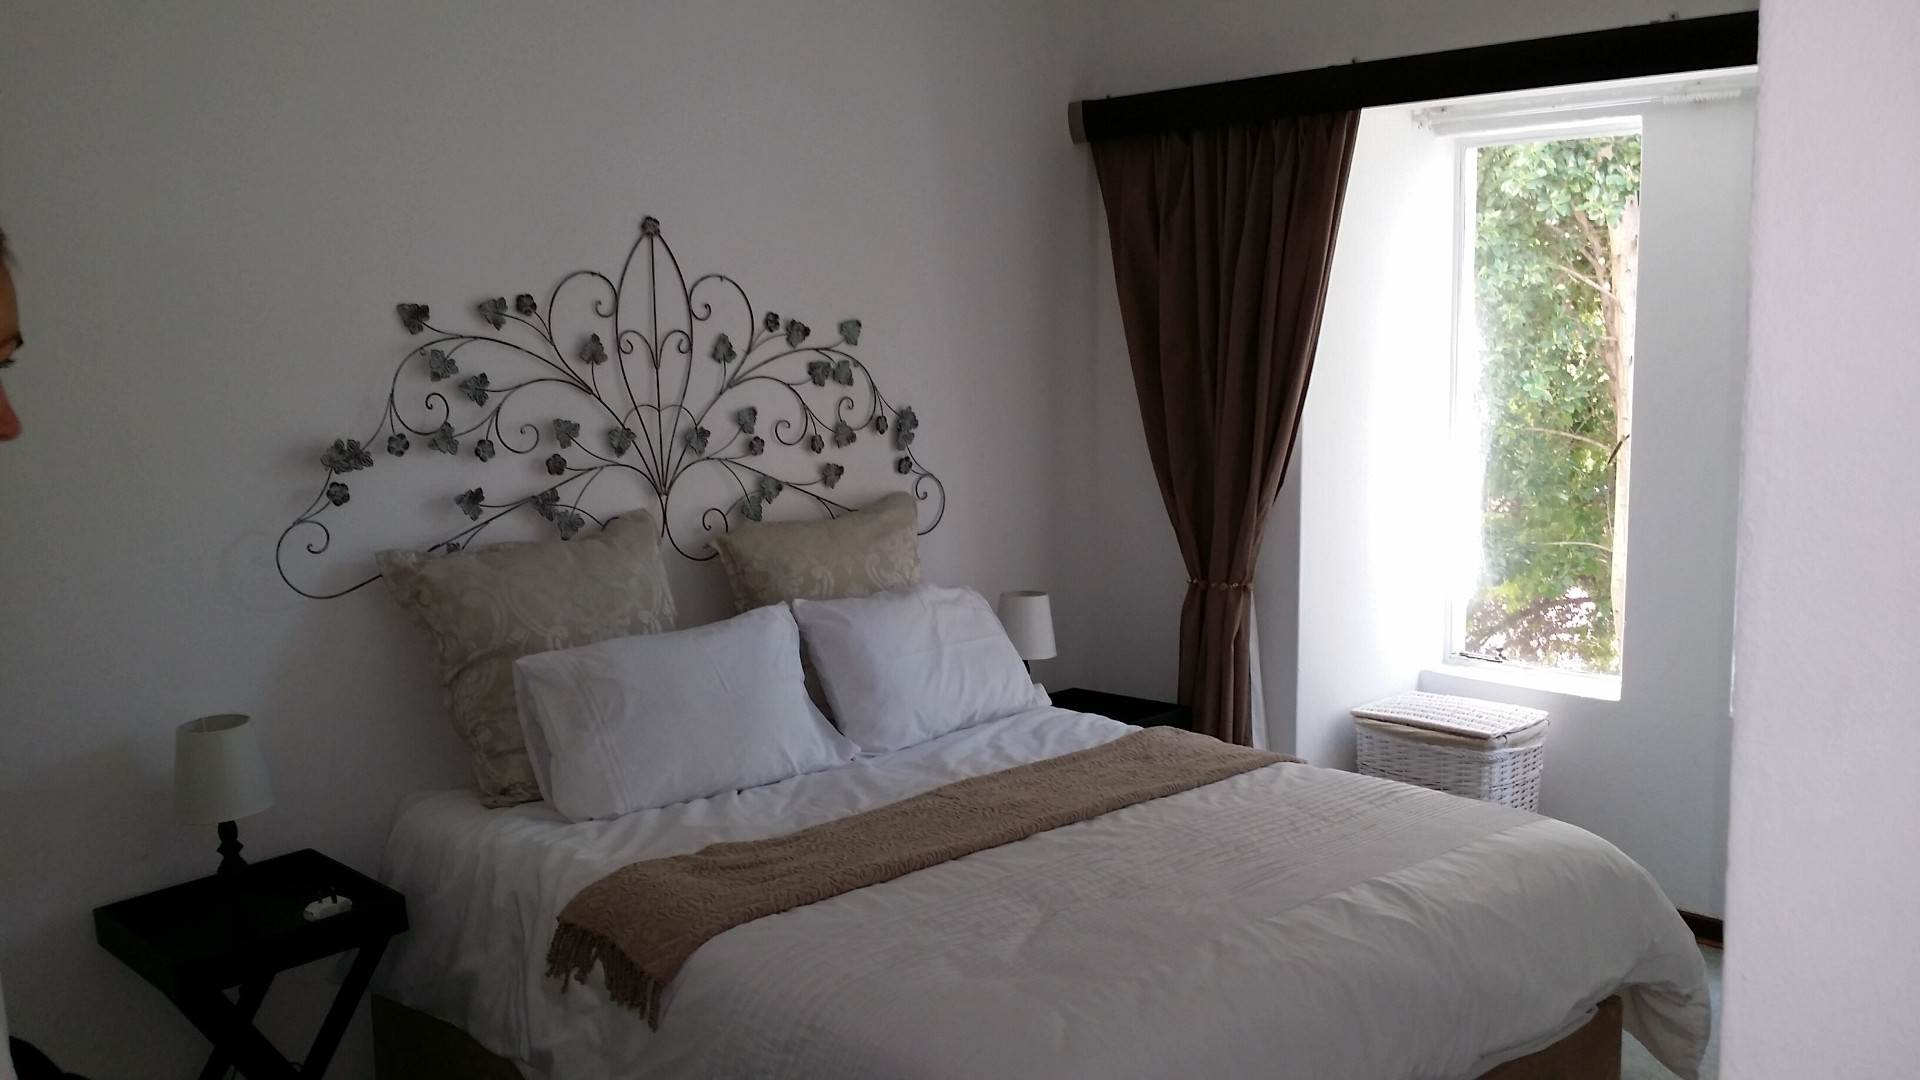 Flat To Rent In Morningside, Sandton, Gauteng for R 15,000 /month